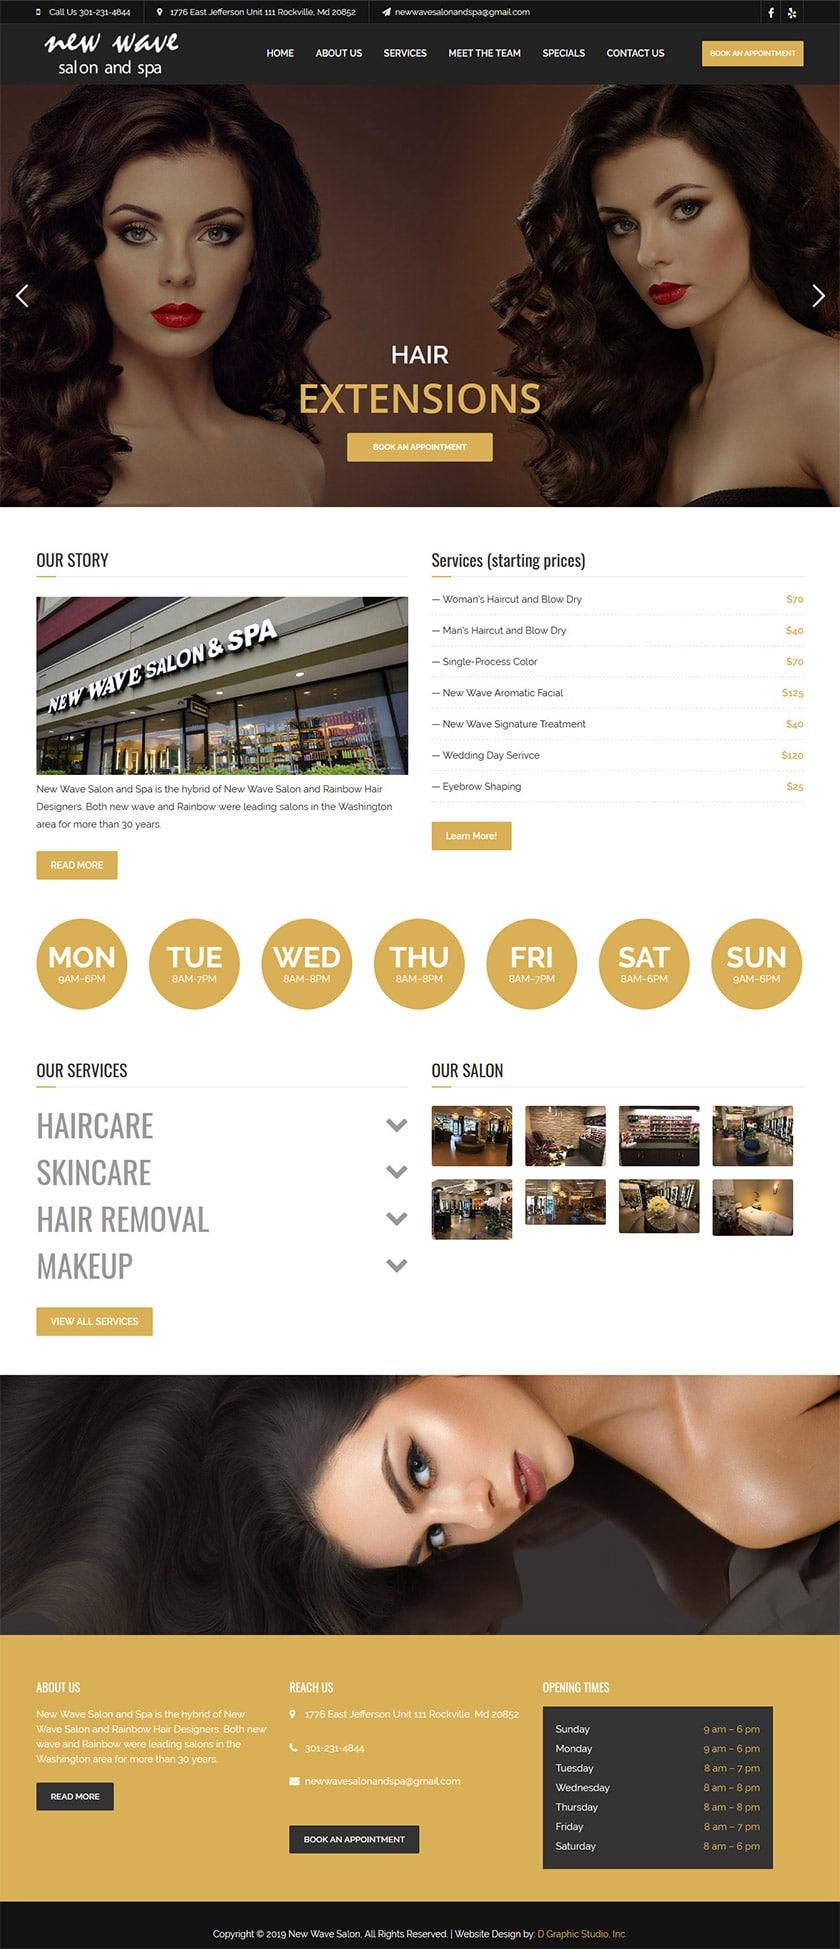 Hair Salon Web Design Services